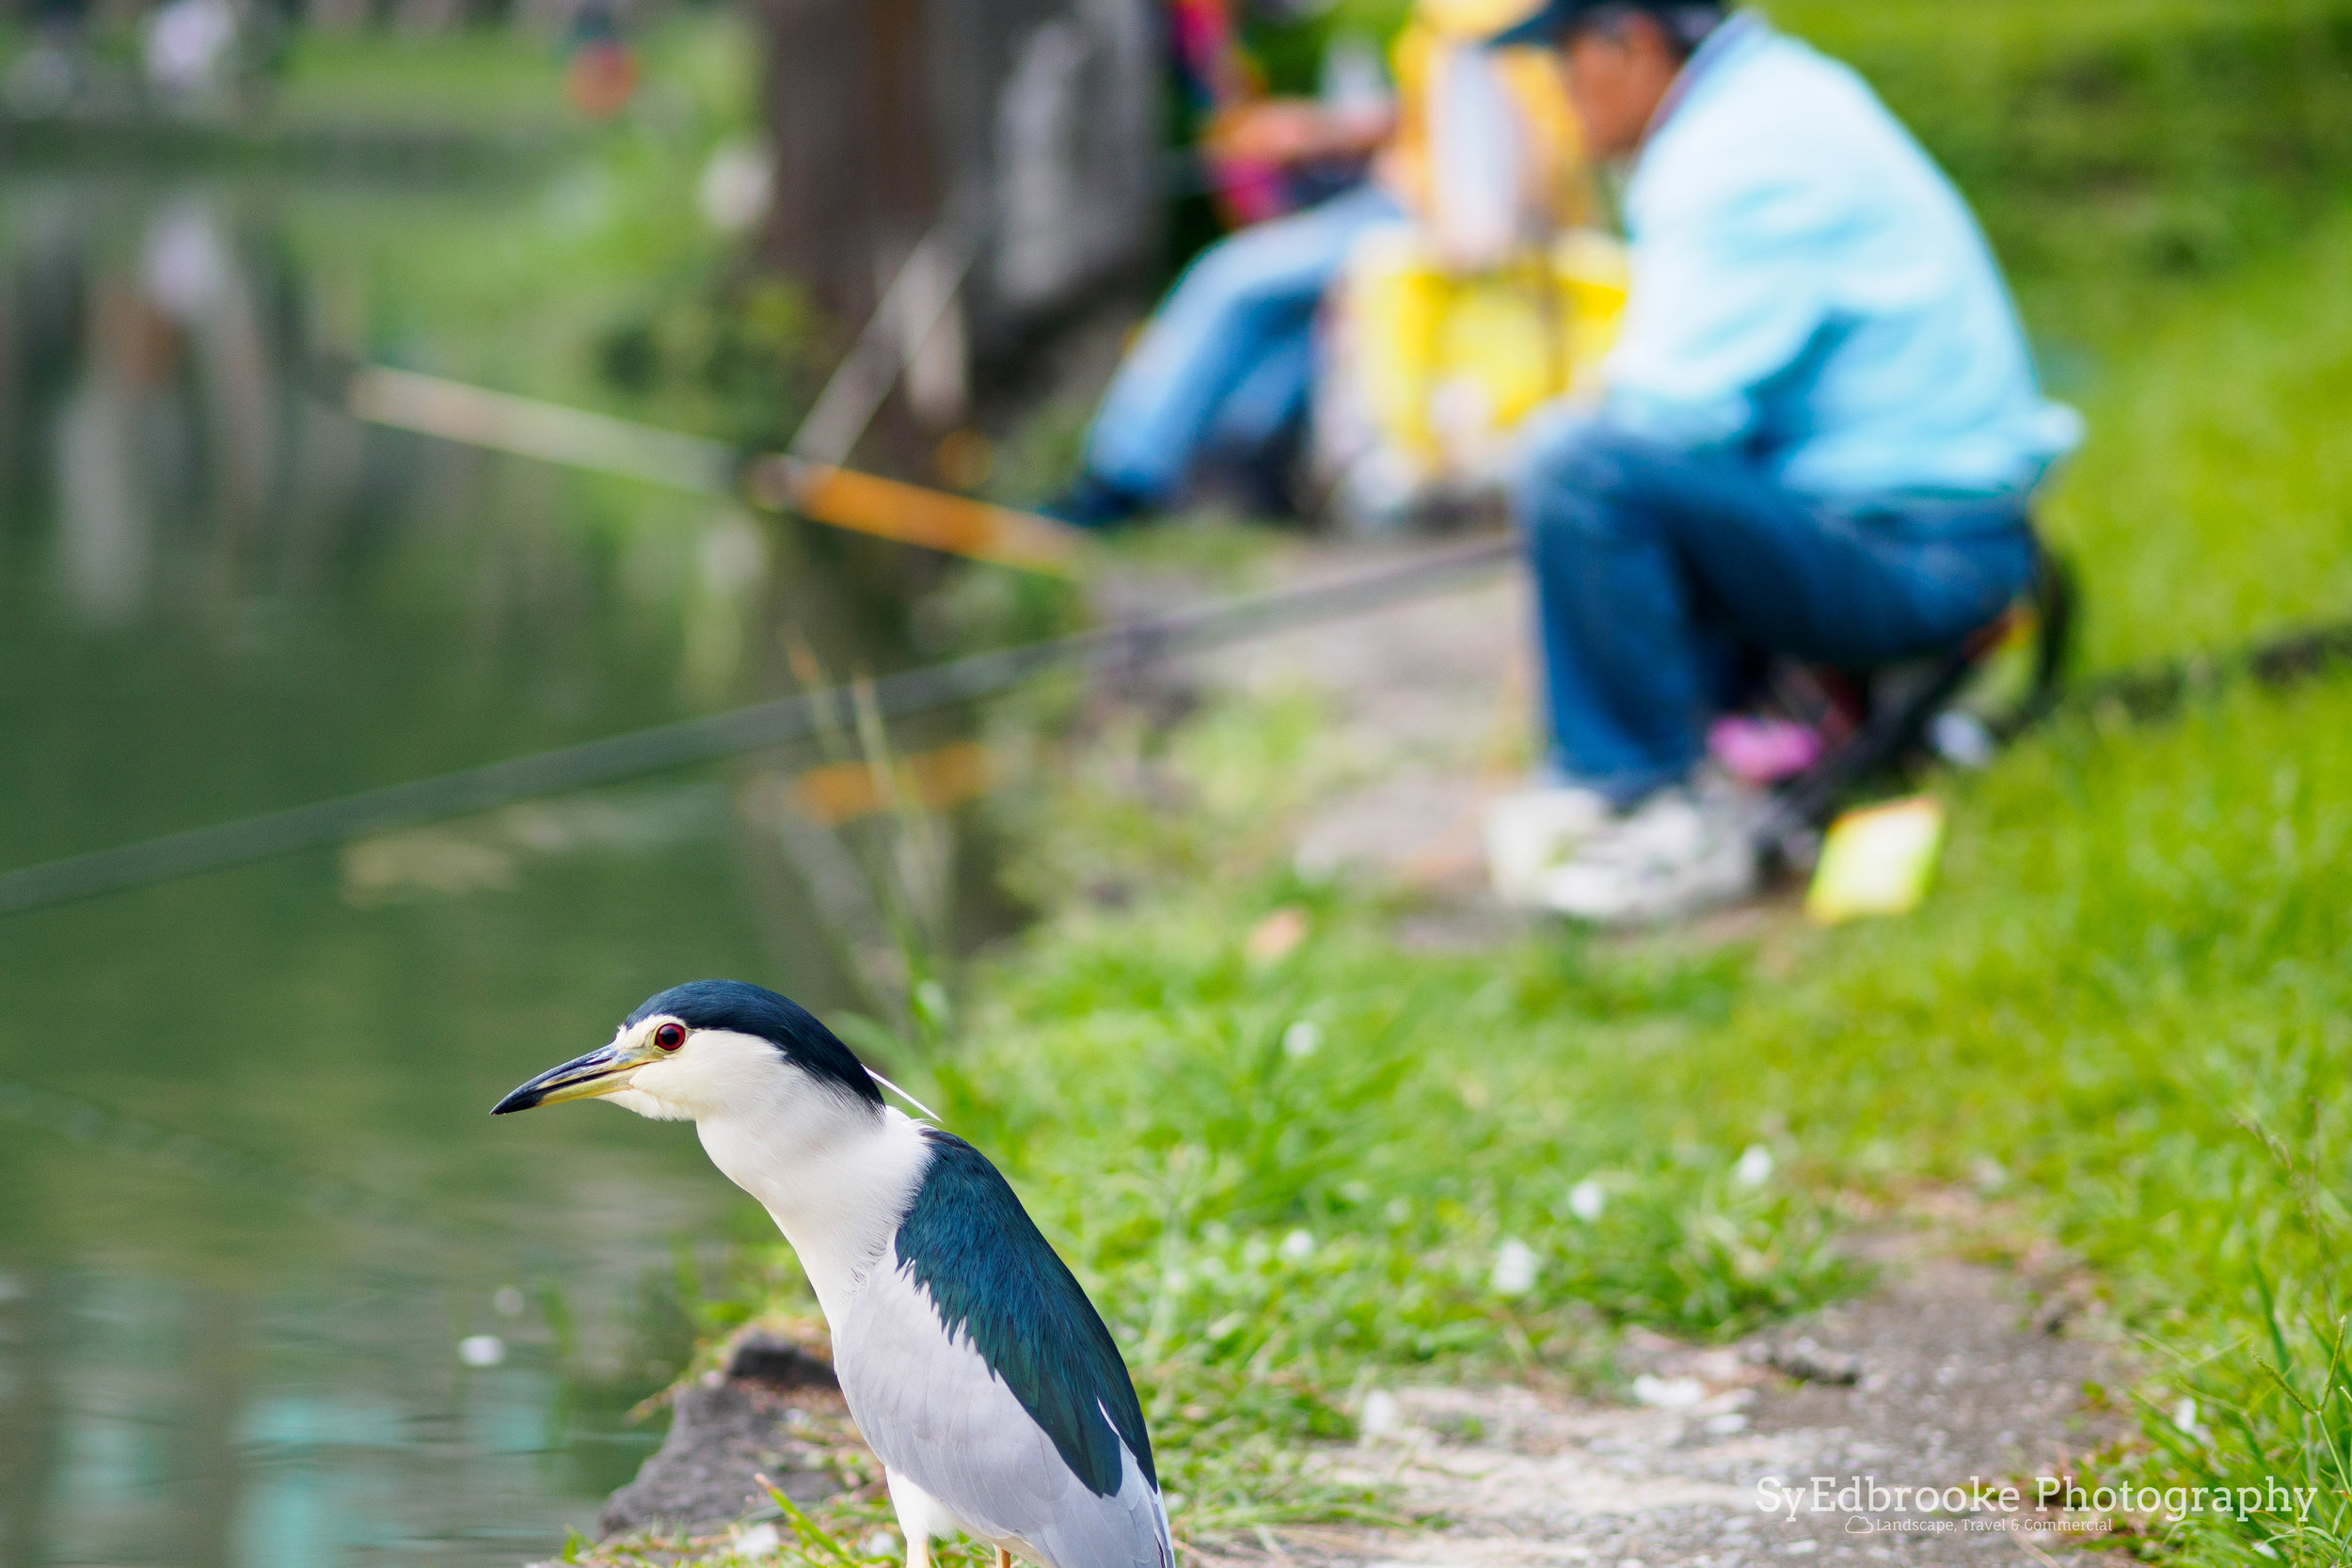 A grumpy fisher bird. f1.8, ISO 200, 1/160, 150mm